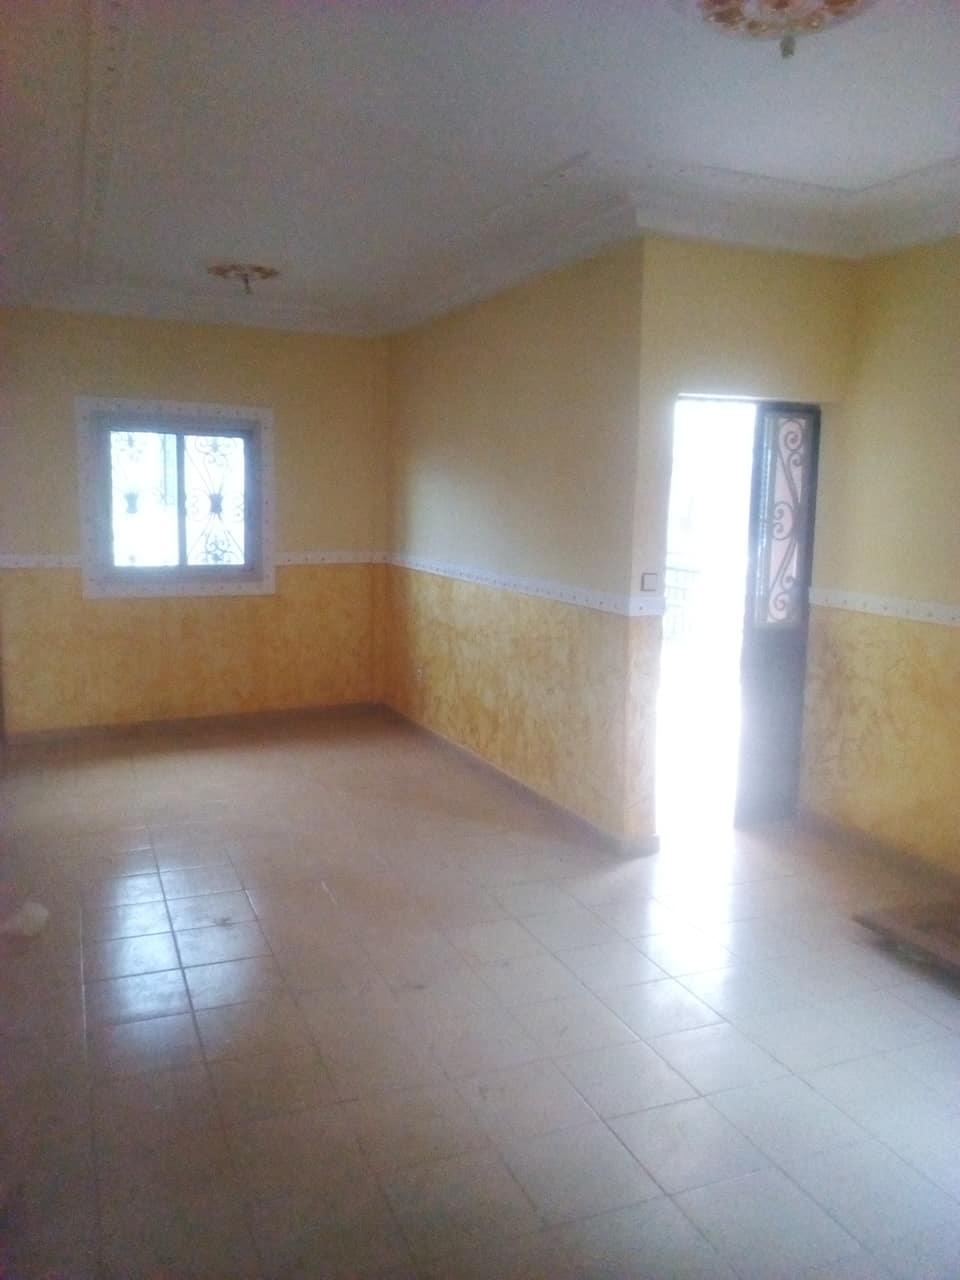 Apartment to rent - Yaoundé, Bastos, pas loin de policlinique - 1 living room(s), 3 bedroom(s), 2 bathroom(s) - 250 000 FCFA / month